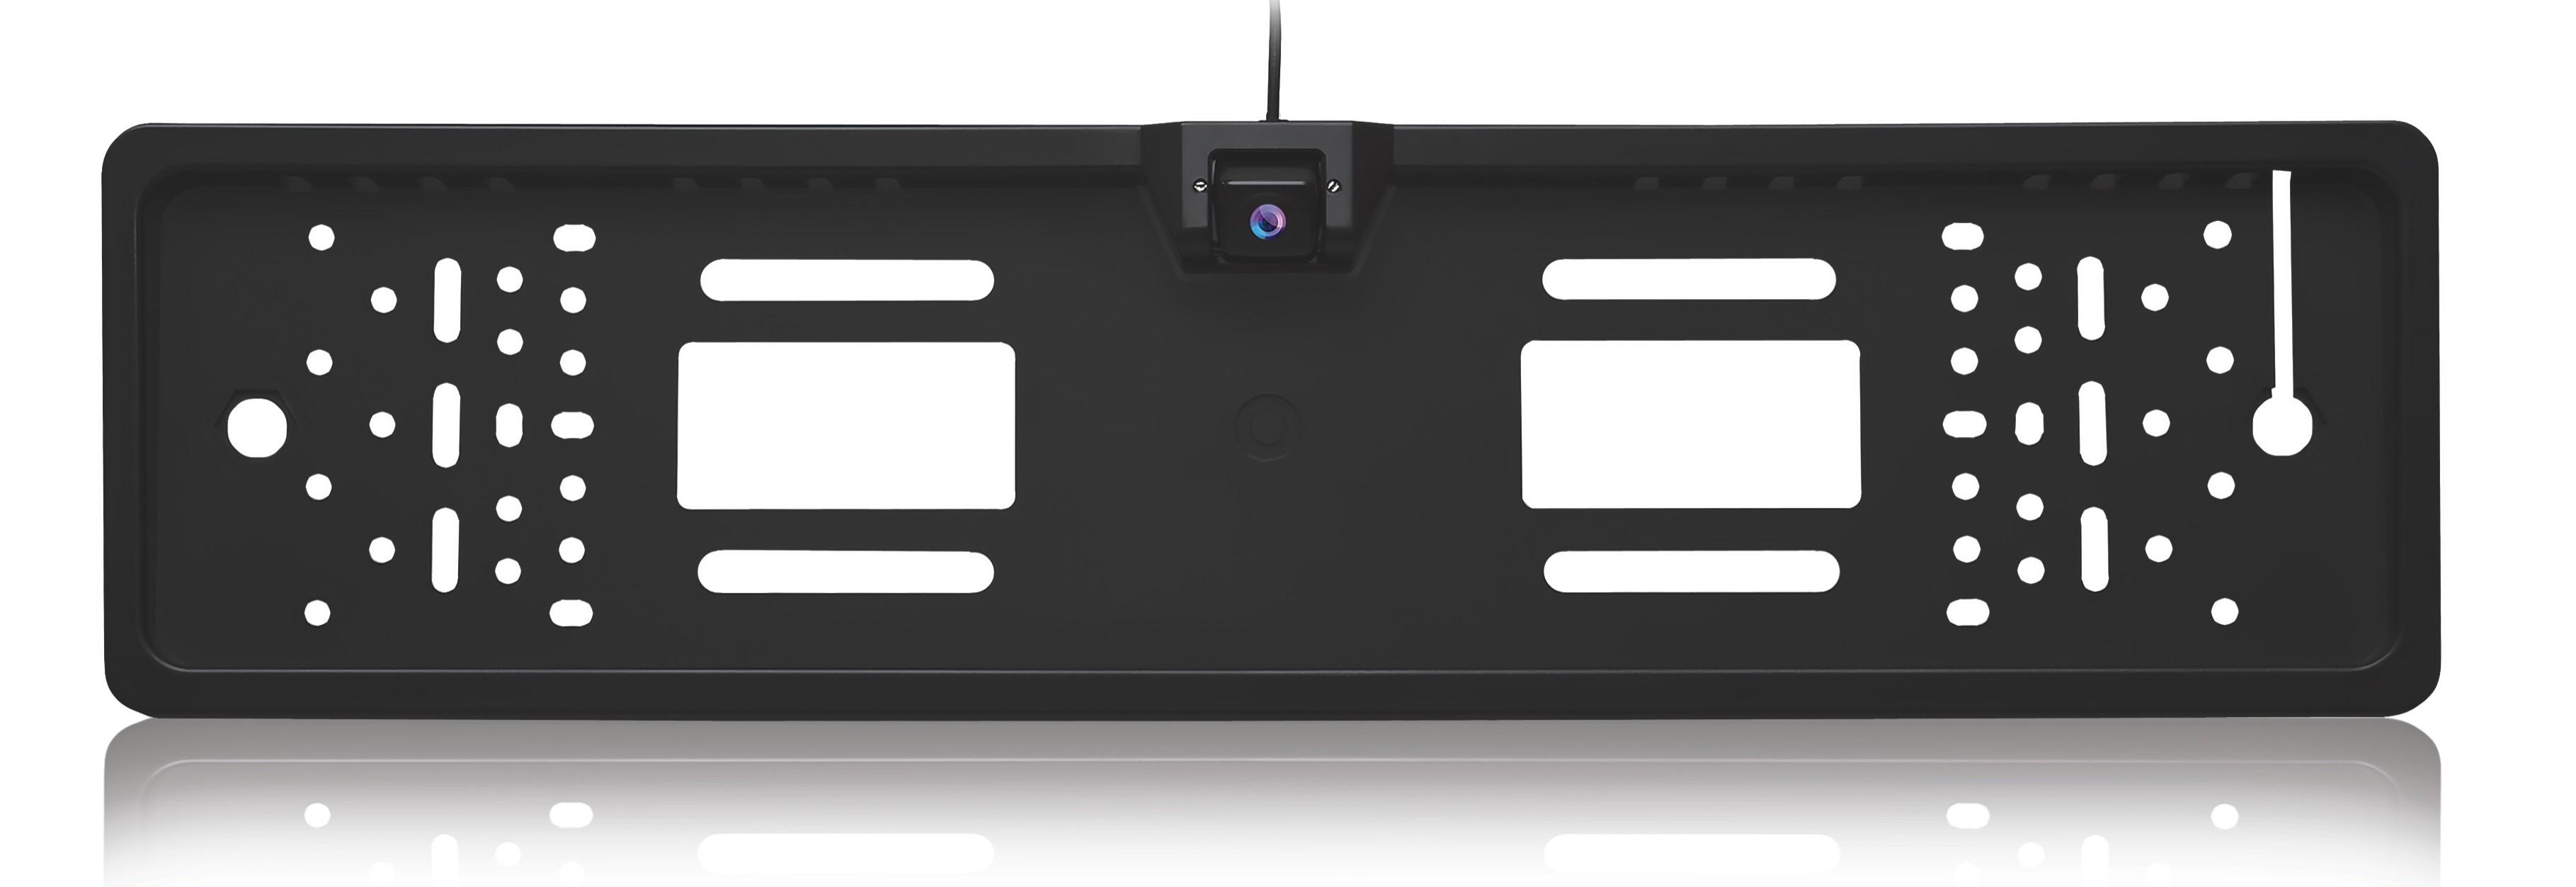 Камера заднего вида Avs Ps-815 от 220 Вольт